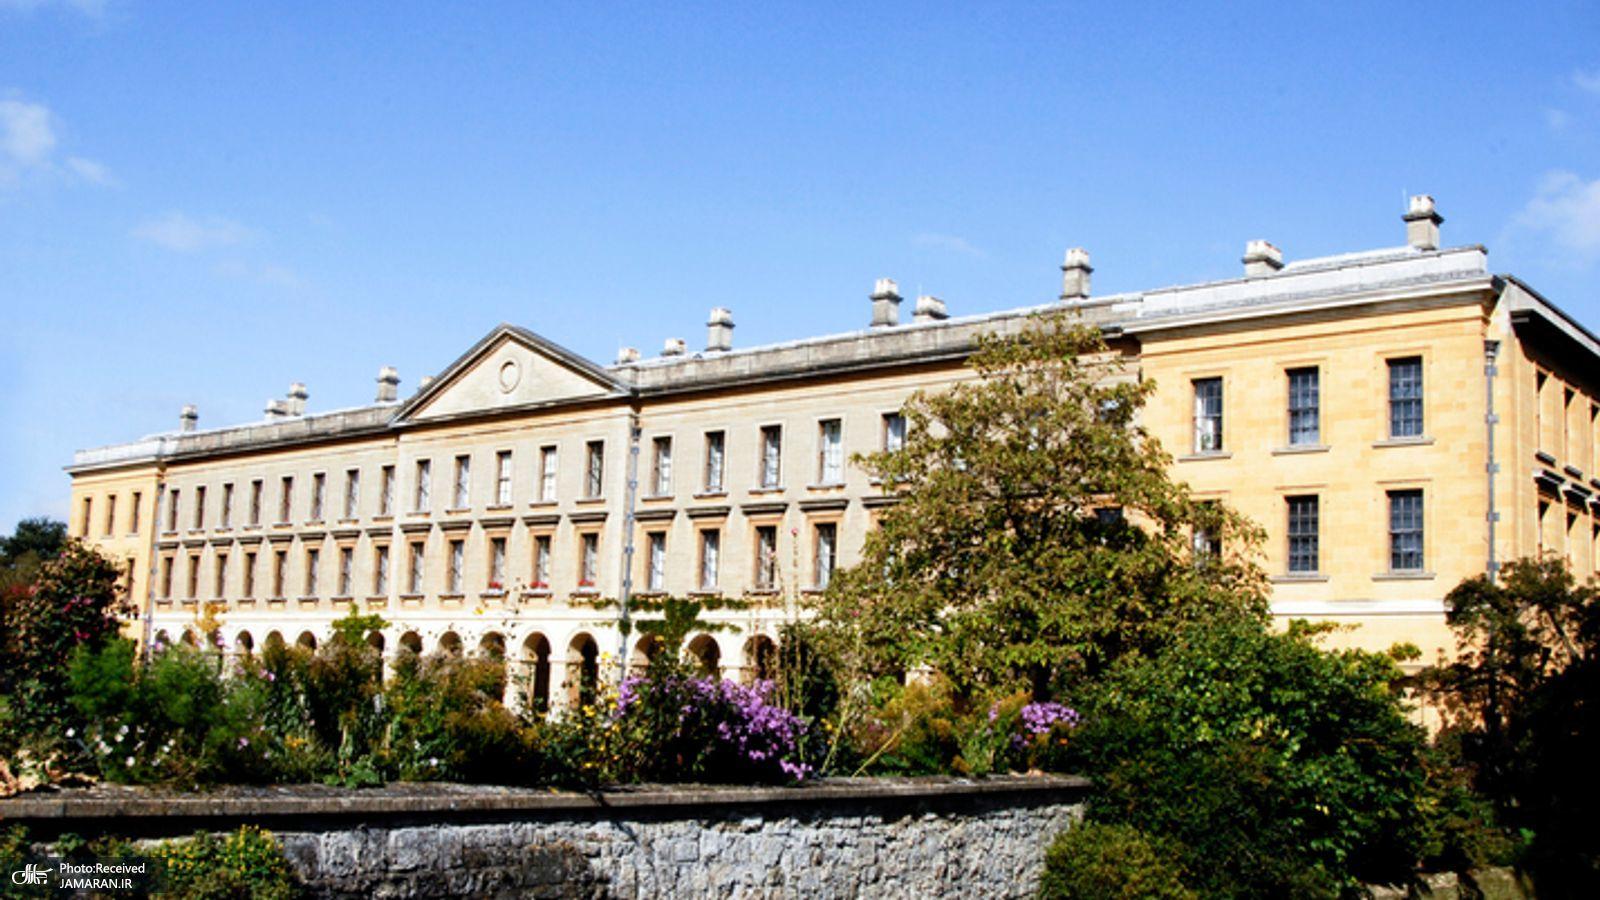 skynews-magdalen-college-oxford-university_5409400